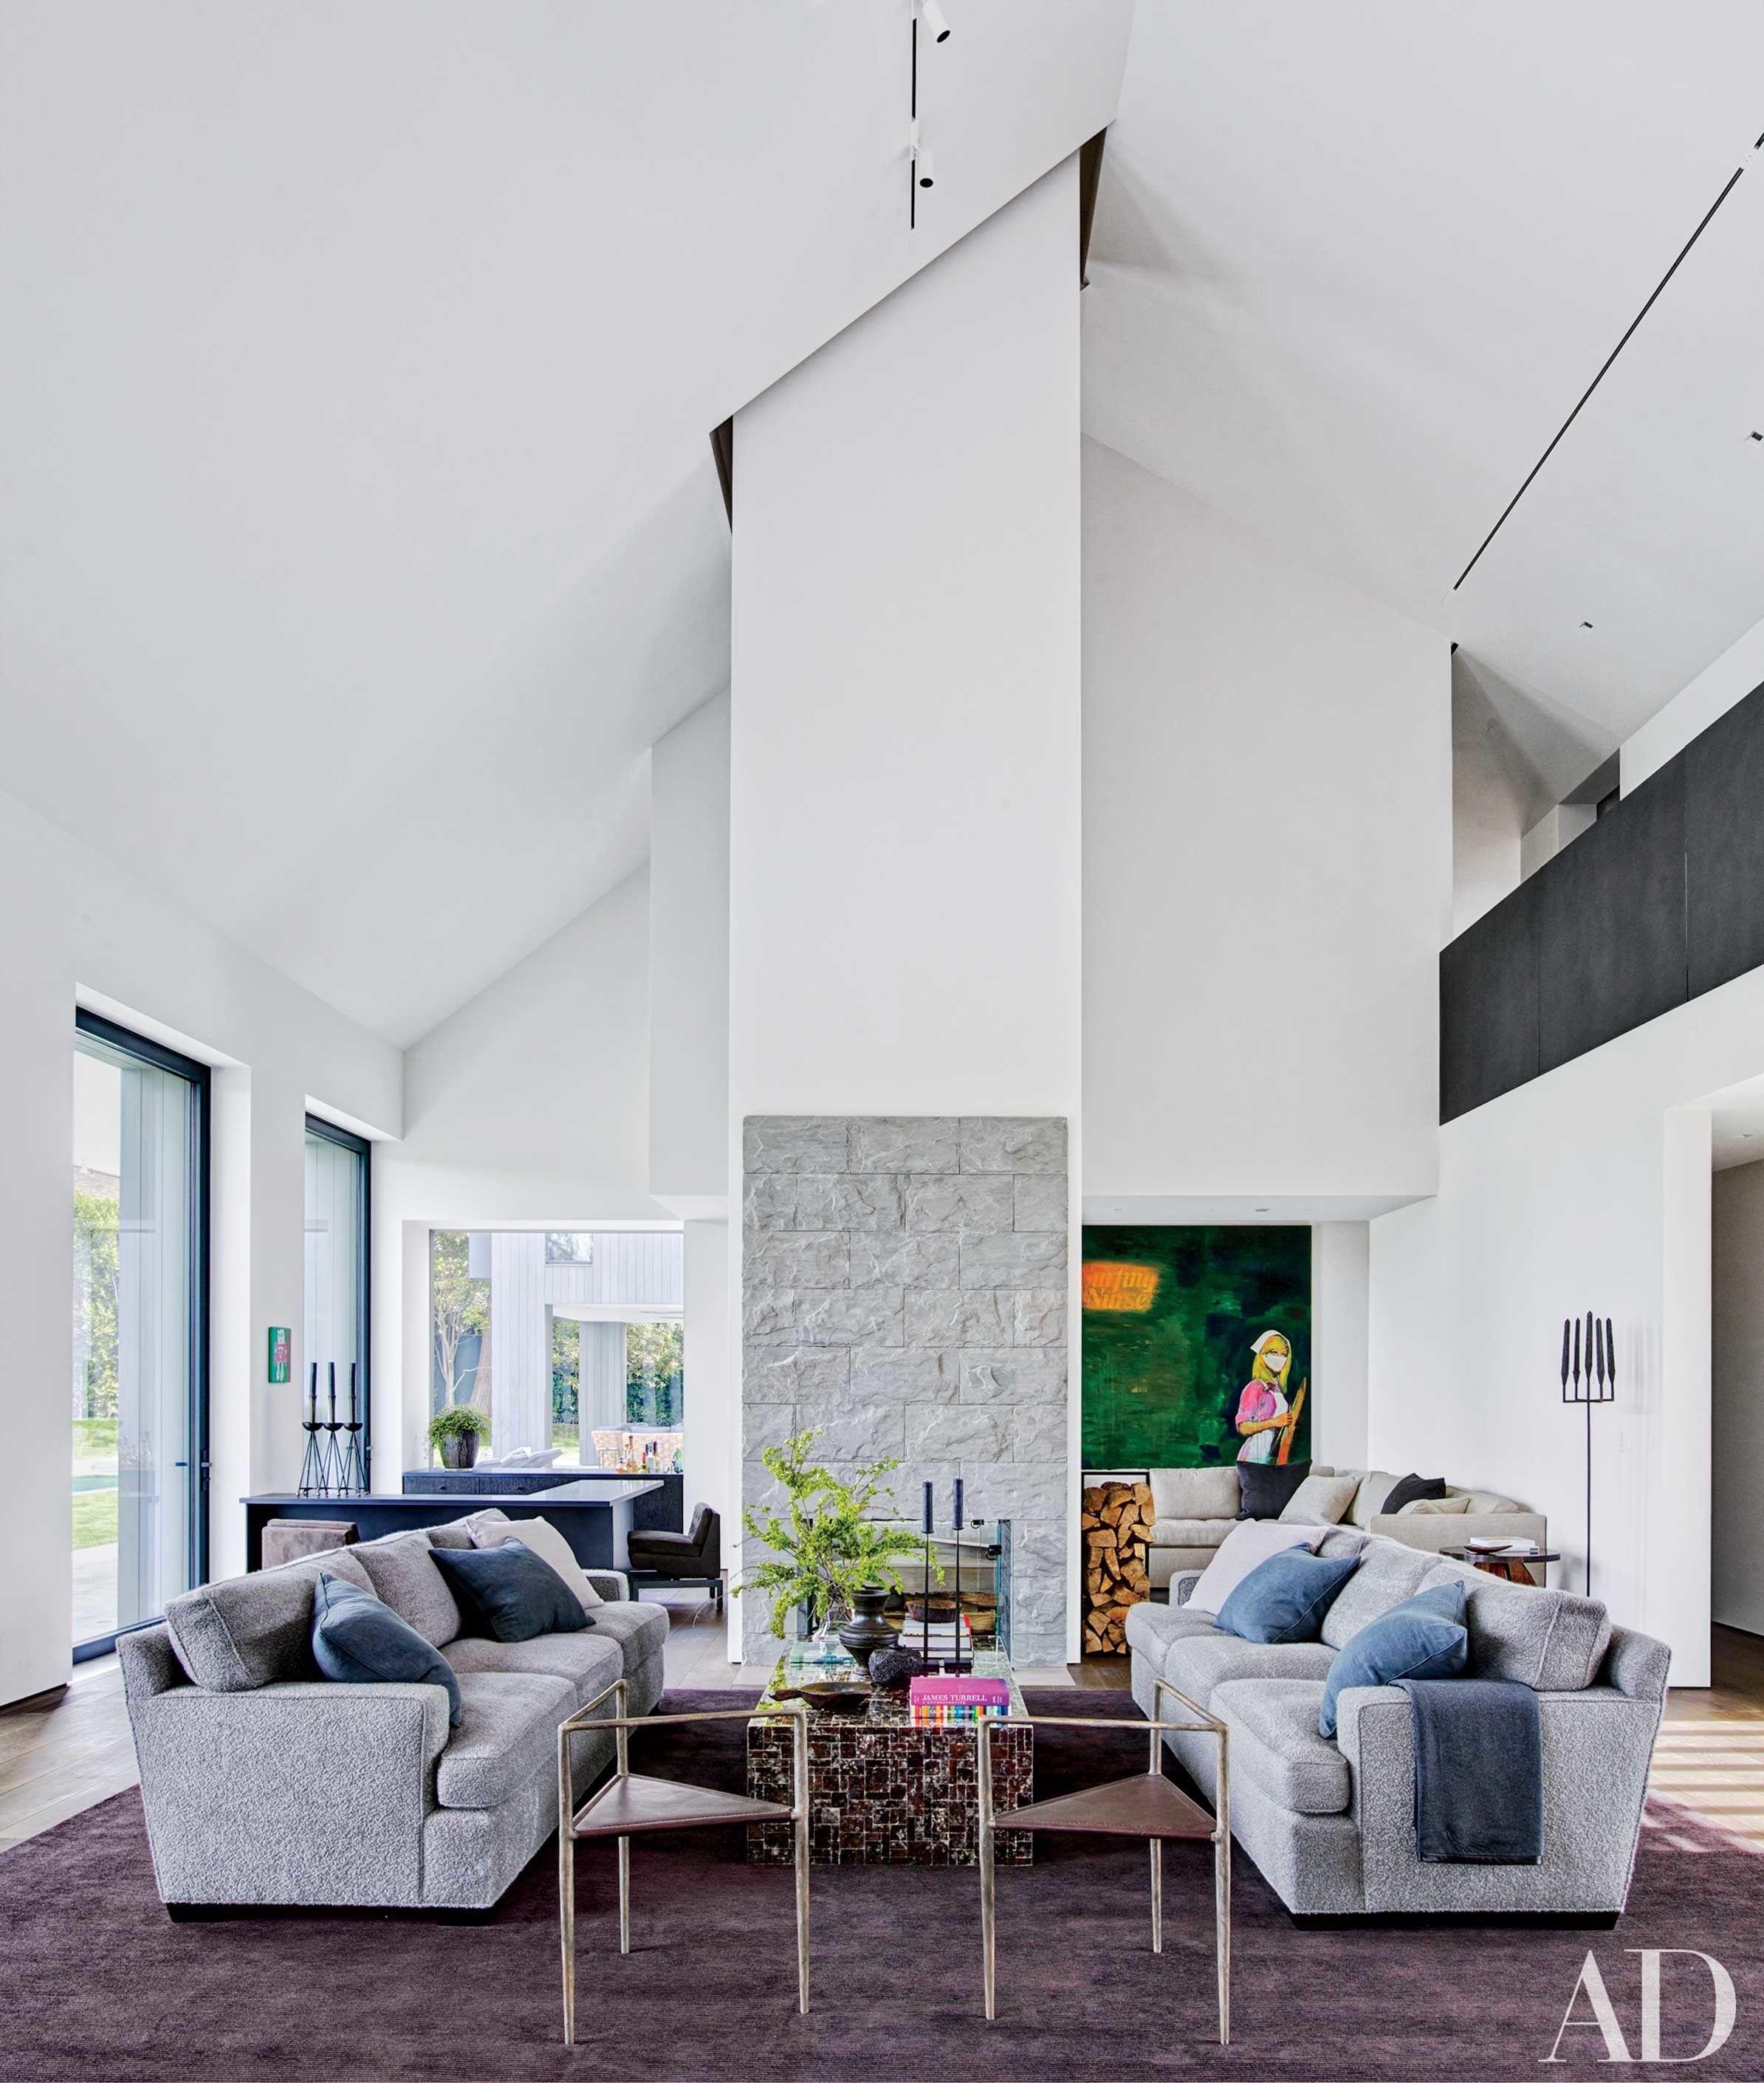 18 Stylish Homes with Modern Interior Design | Modern interiors ...